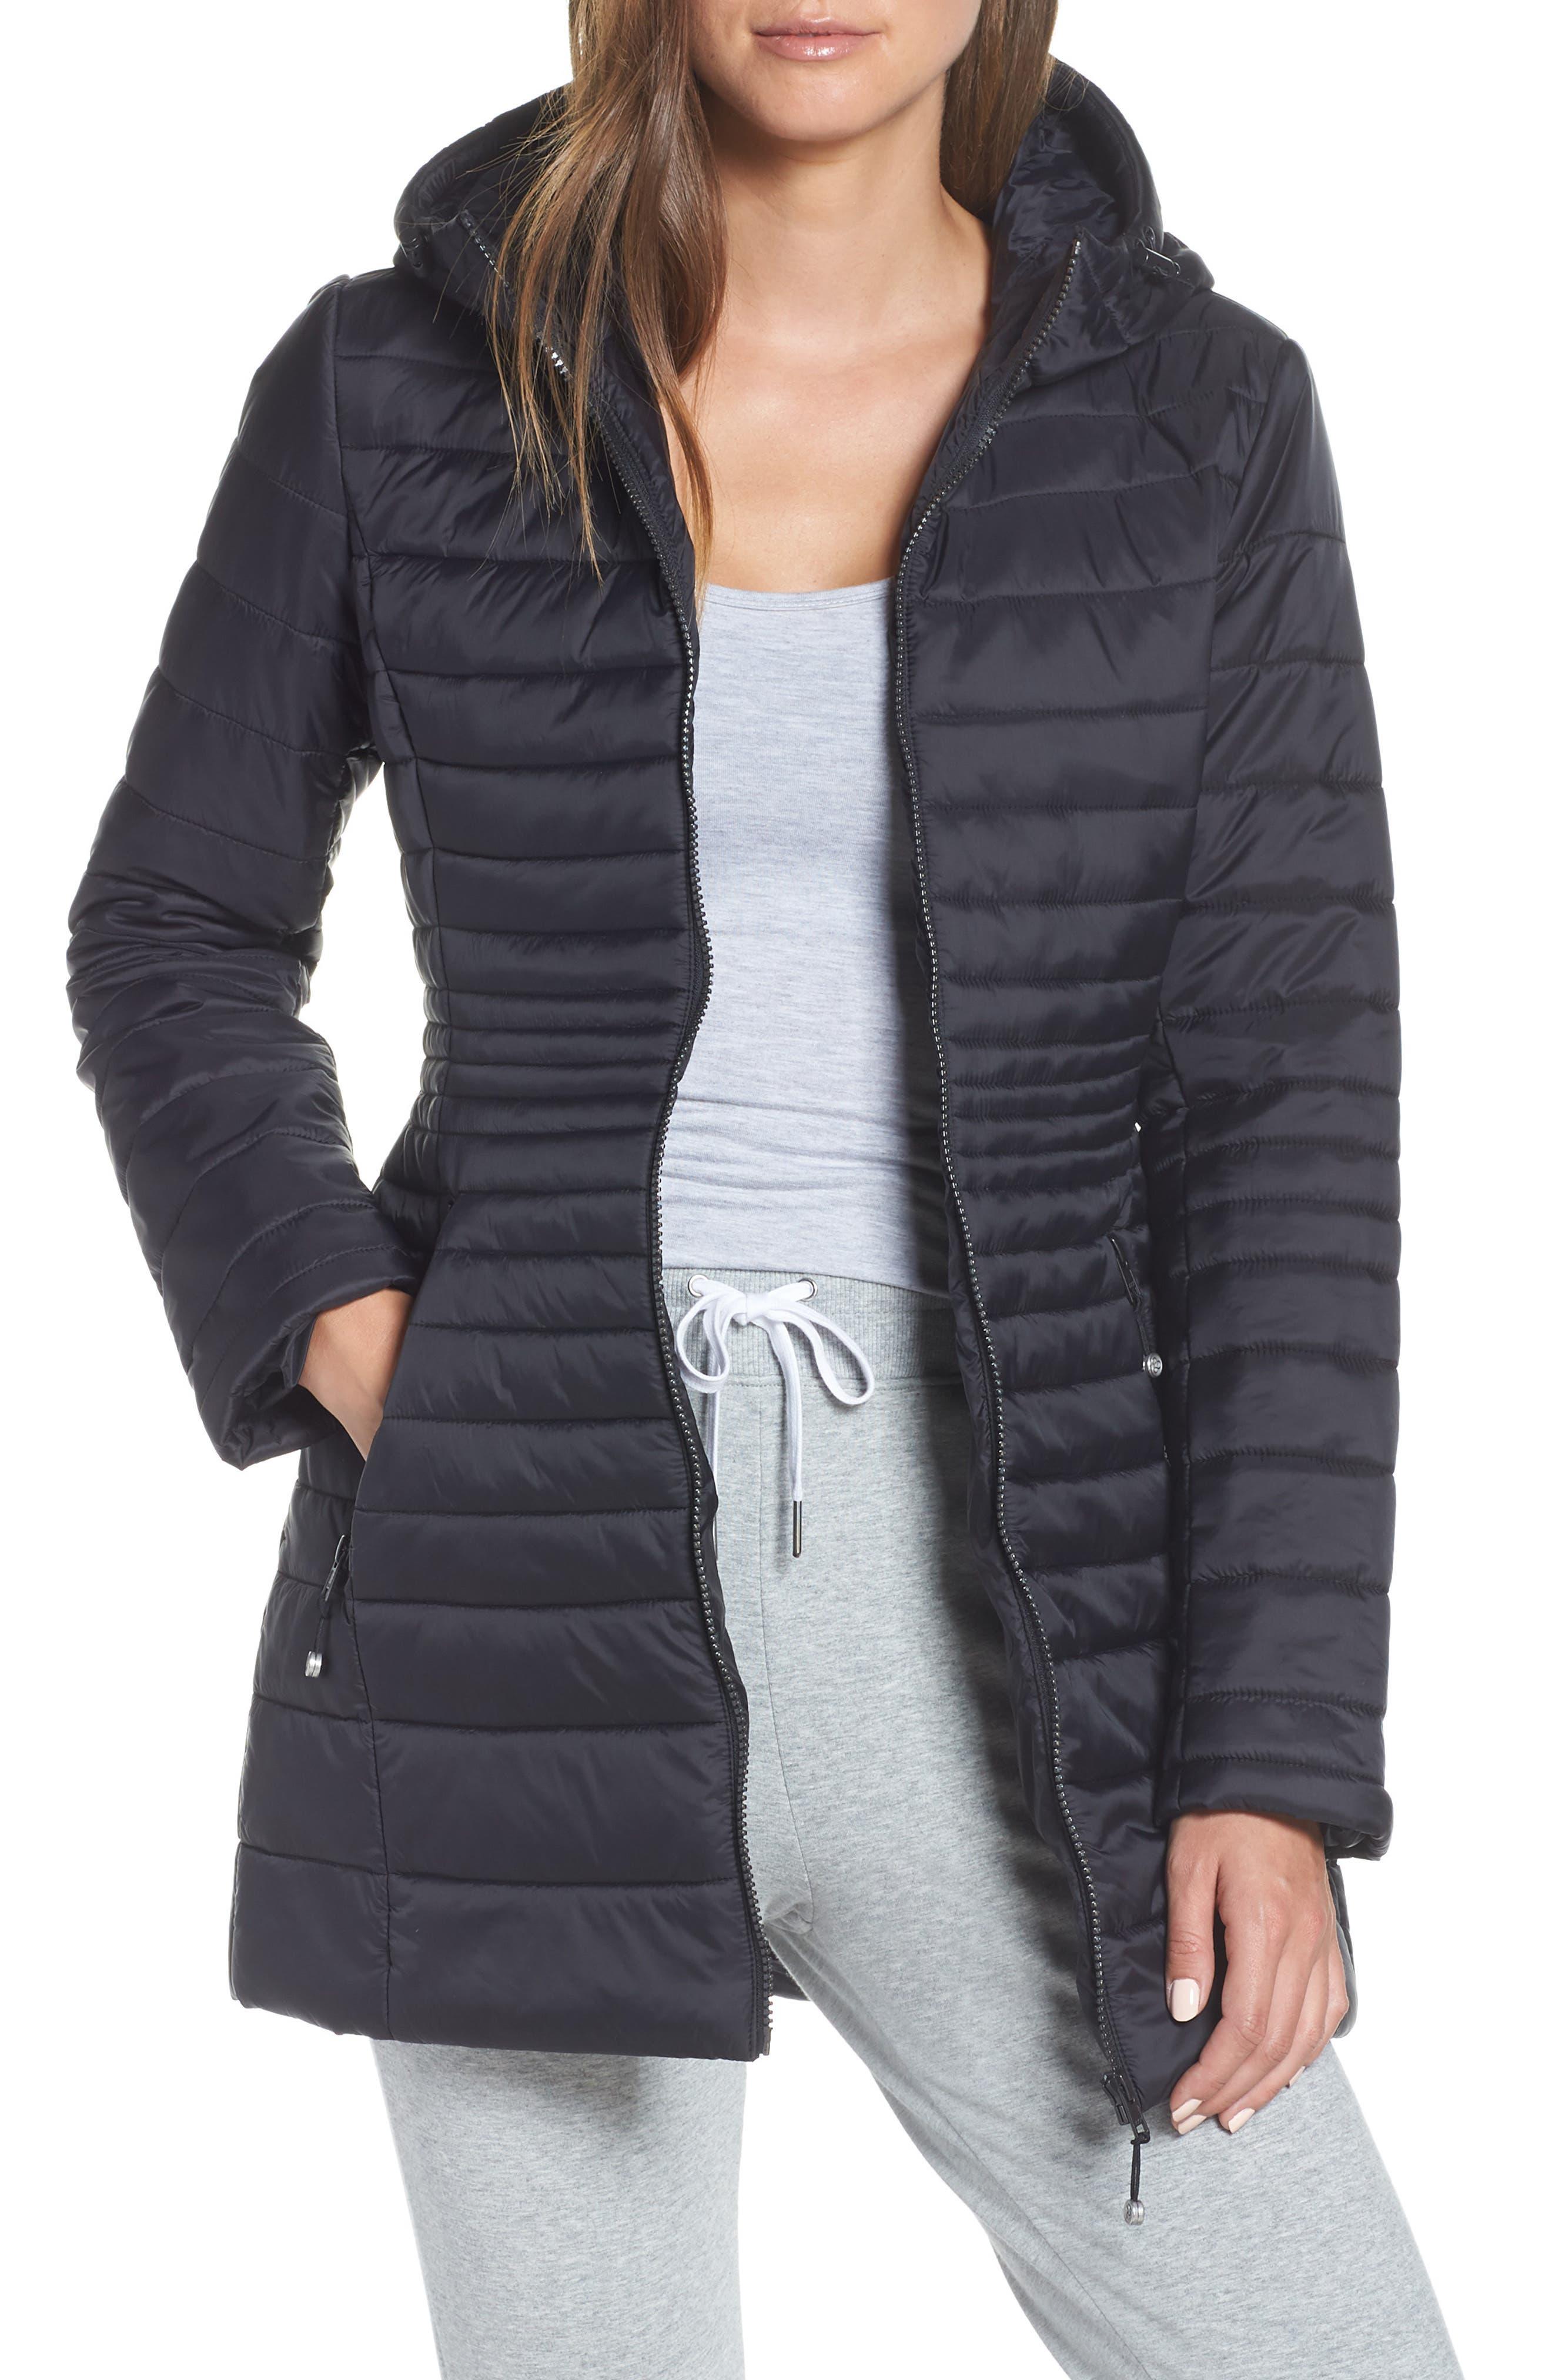 ZELLA City Dweller Water Resistant Puffer Jacket, Main, color, 001